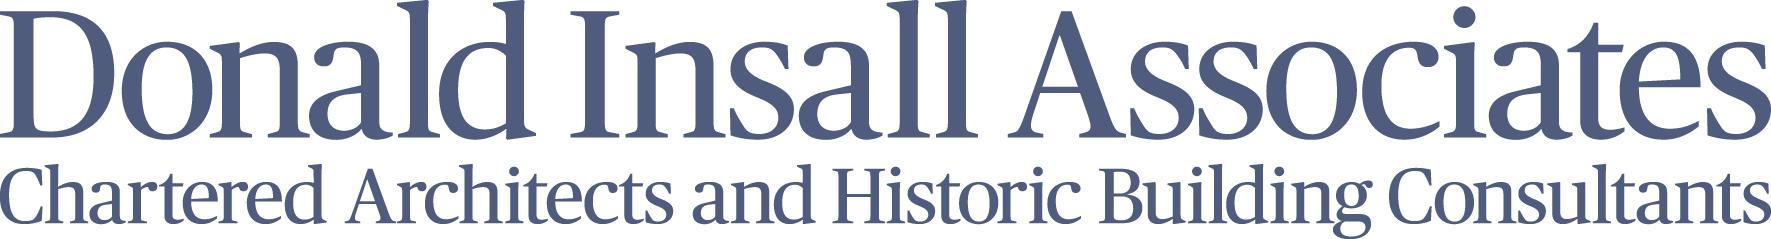 Loog of Donald Insall Associates